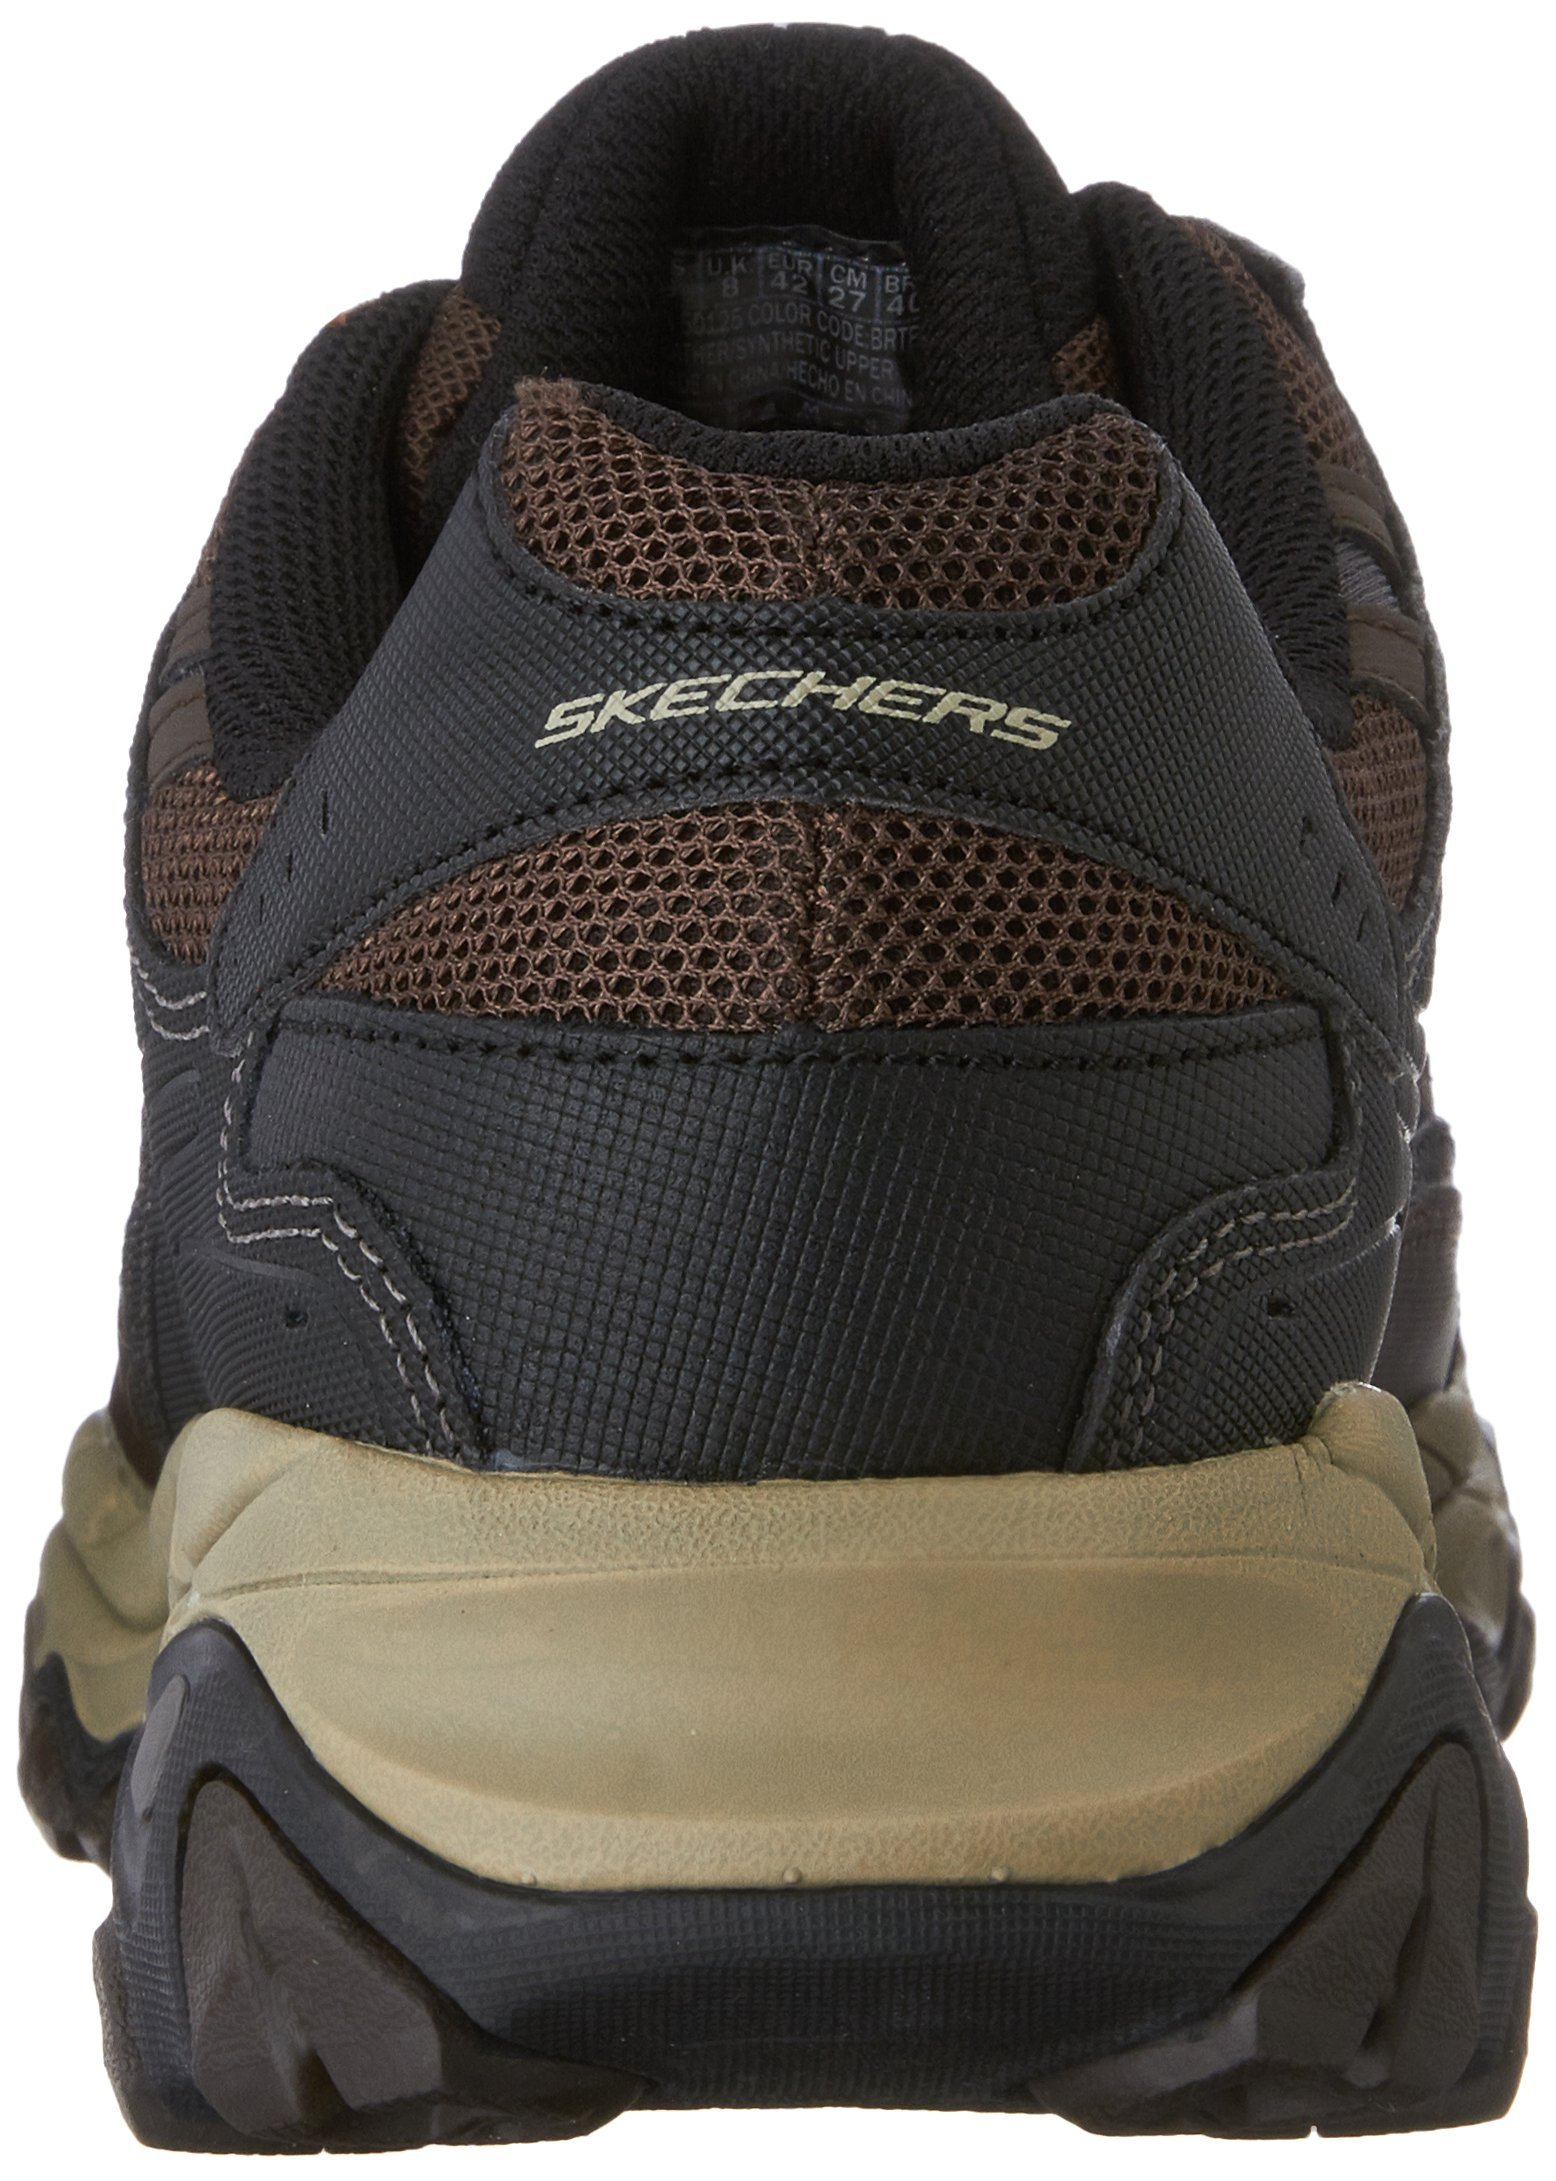 Skechers Men's AFTERBURNM.FIT Memory Foam Lace-Up Sneaker, Brown/Taupe, 7.5 M US by Skechers (Image #2)